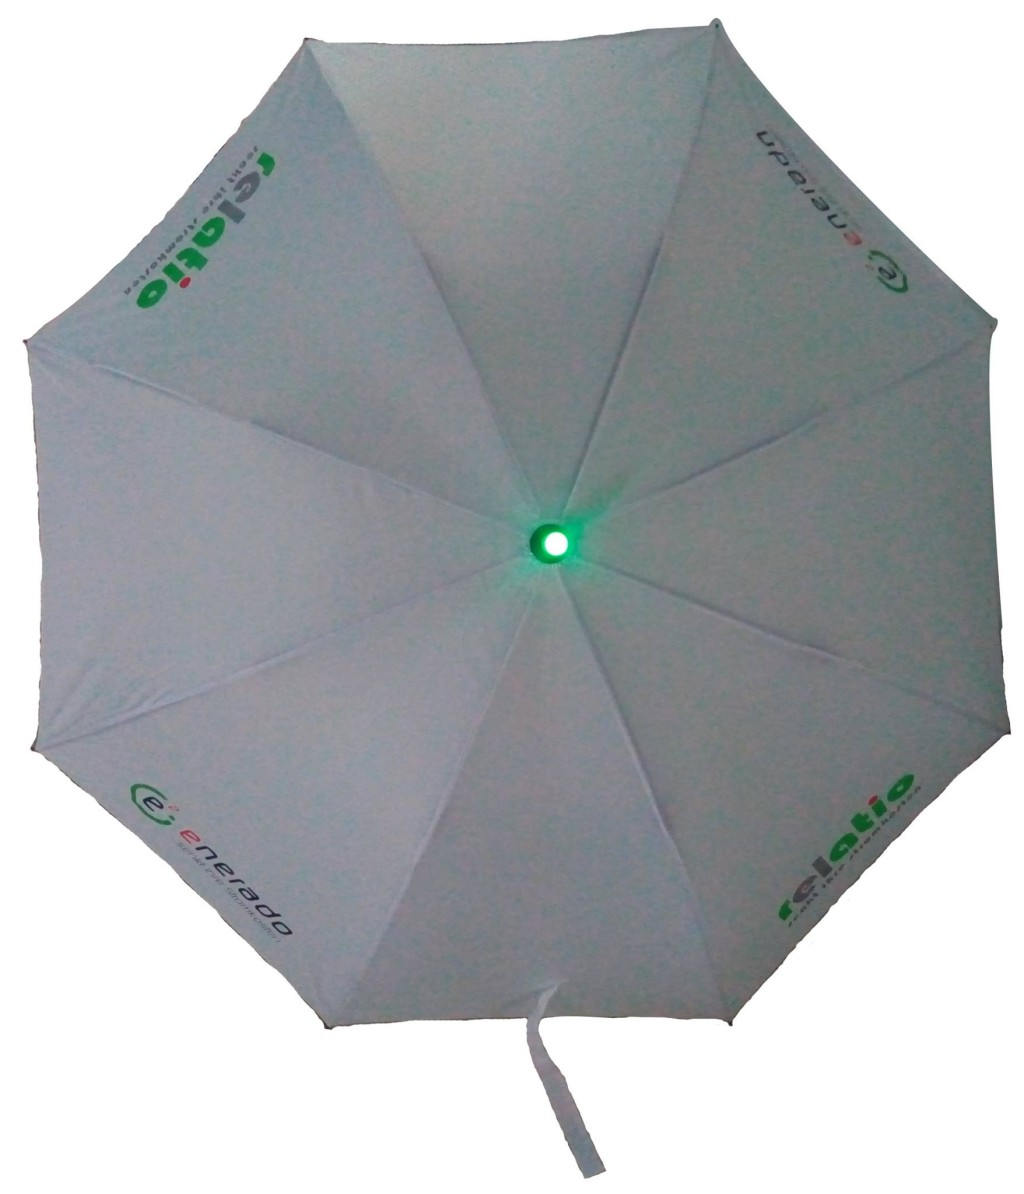 be seen brella lightsaber umbrella 4